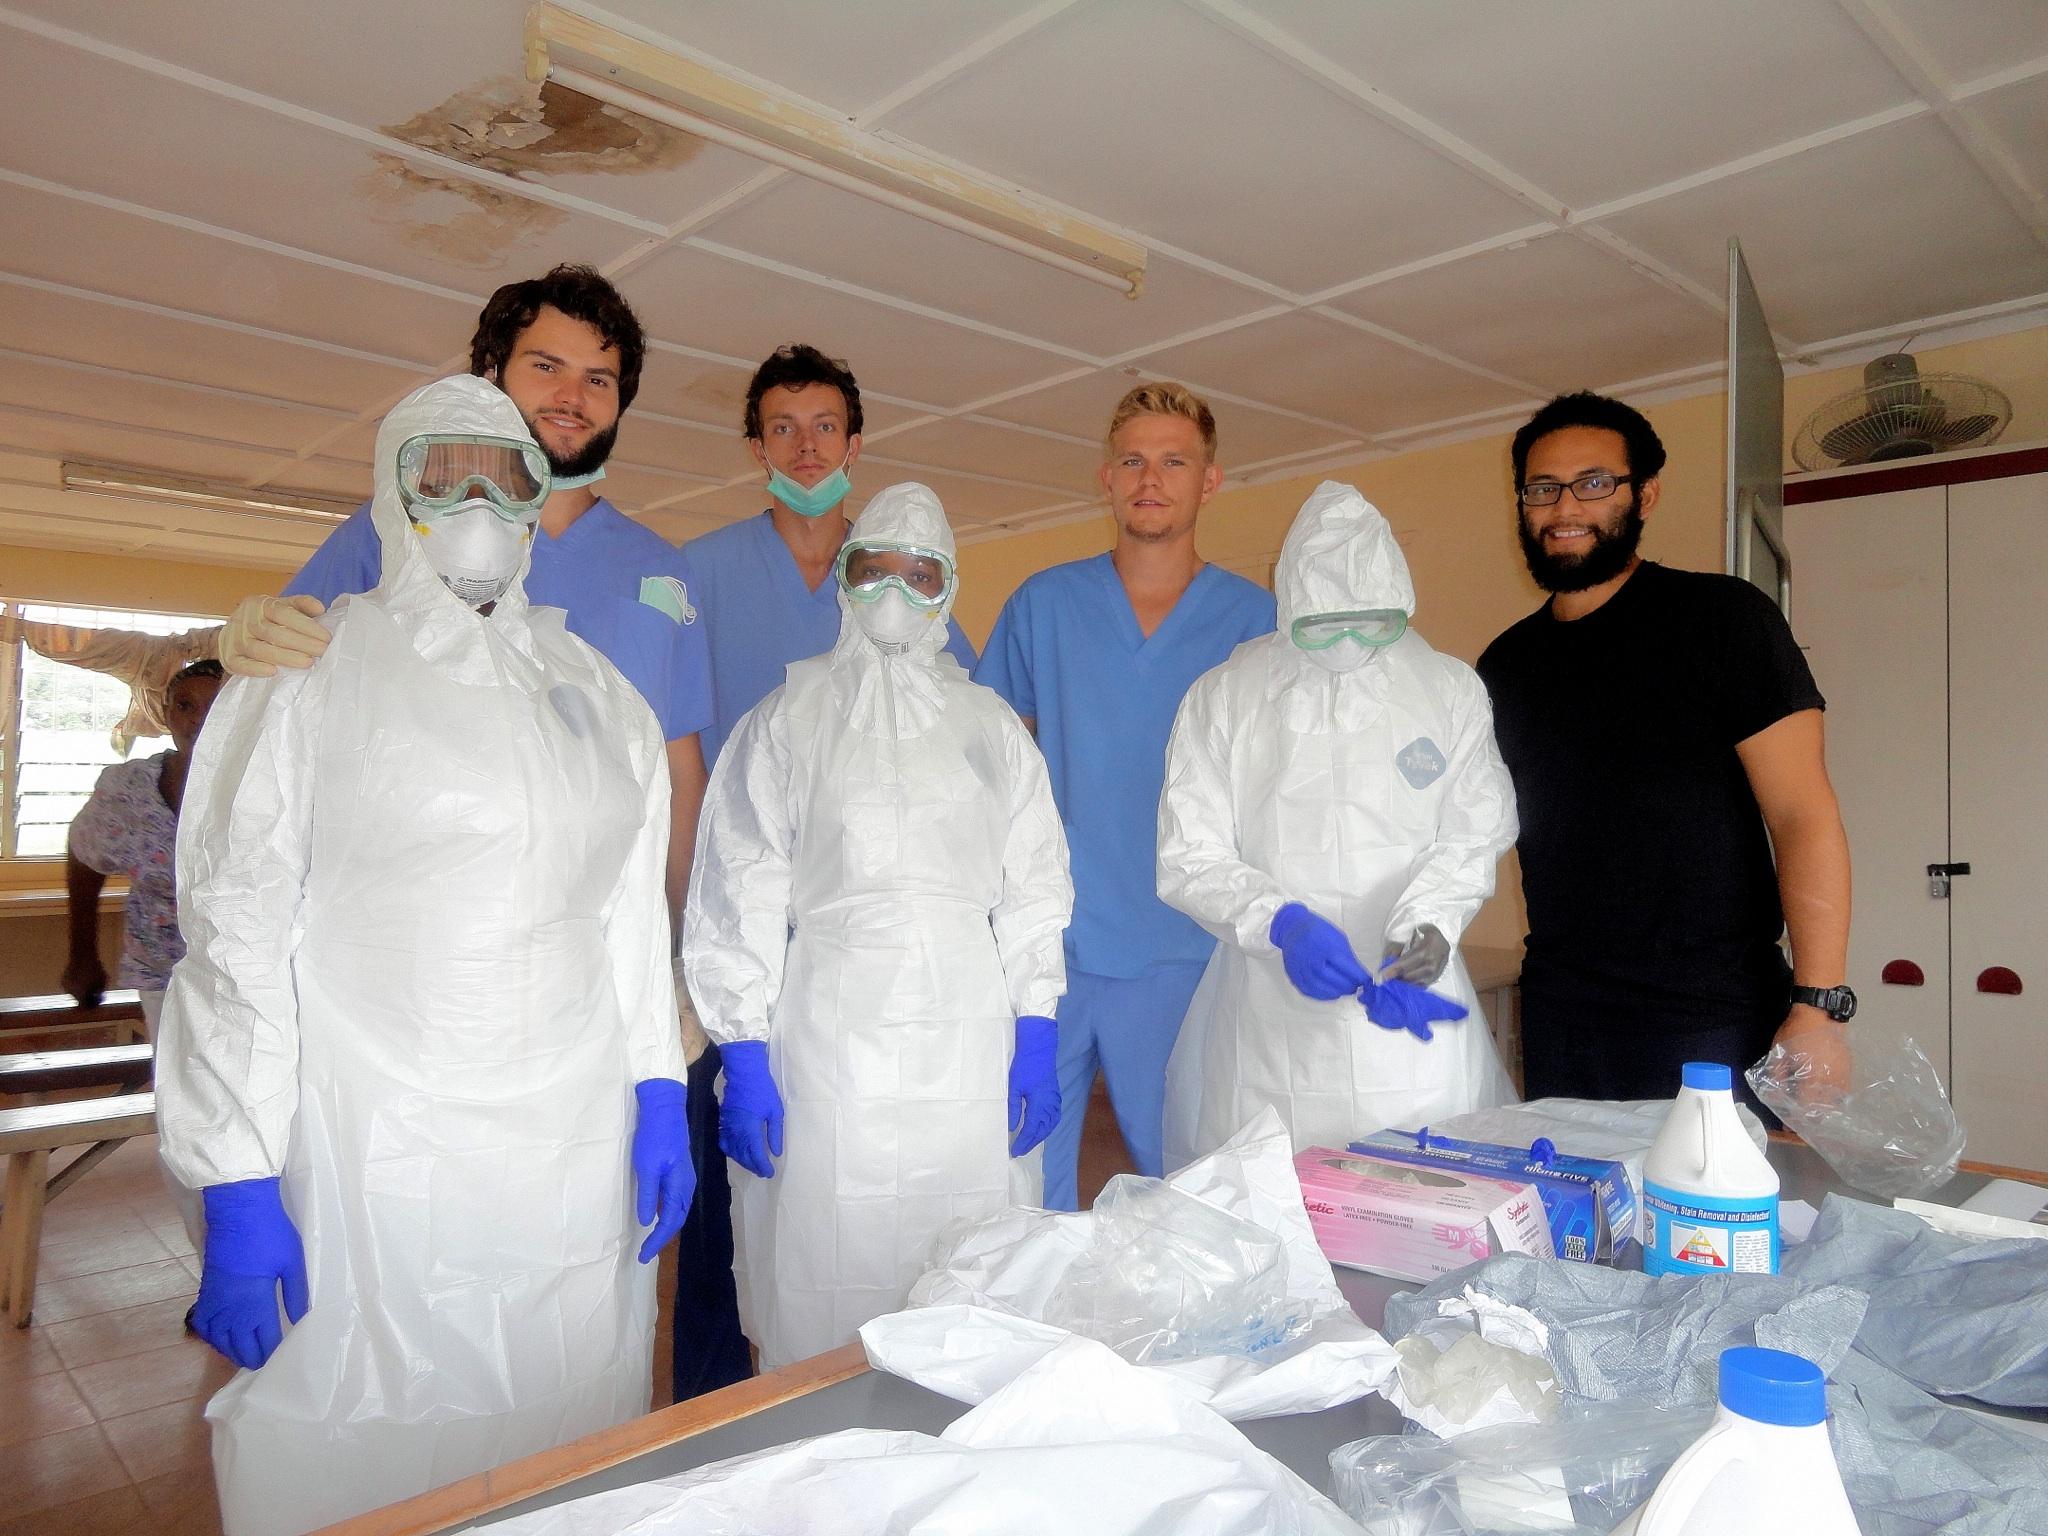 OEBPS/images/09_01_A_10_2014_Ebola_image_03.jpg